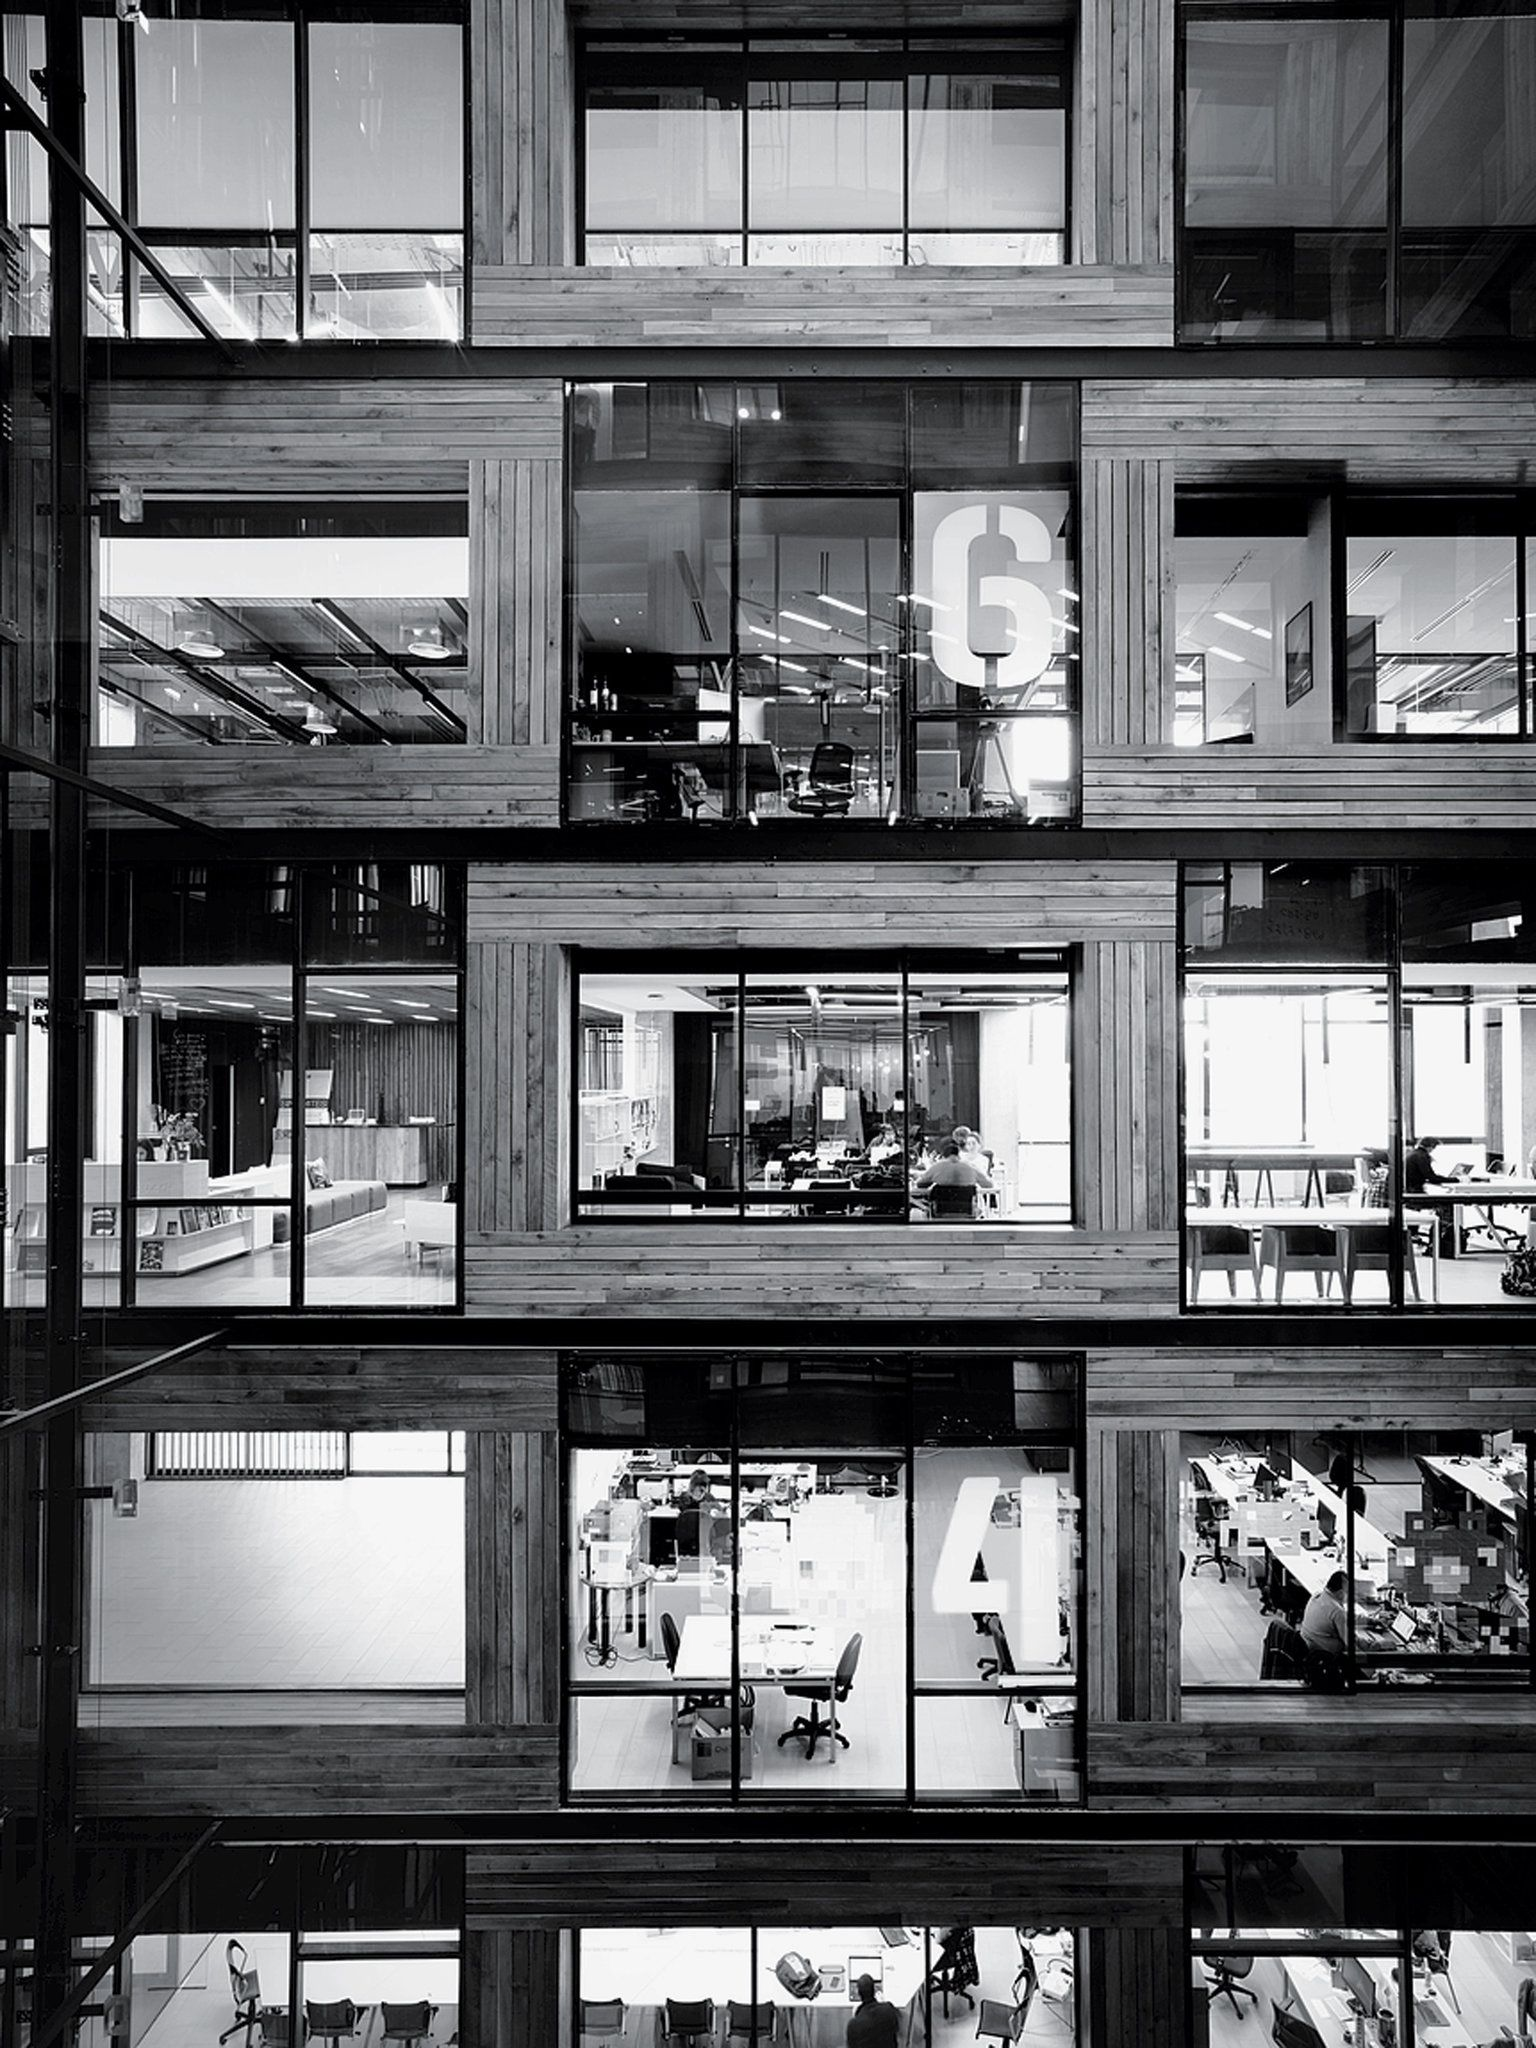 Alejandro Aravena / Elemental http://www.nytimes.com/2016/05/23/t-magazine/pritzker-venice-biennale-chile-architect-alejandro-aravena.html